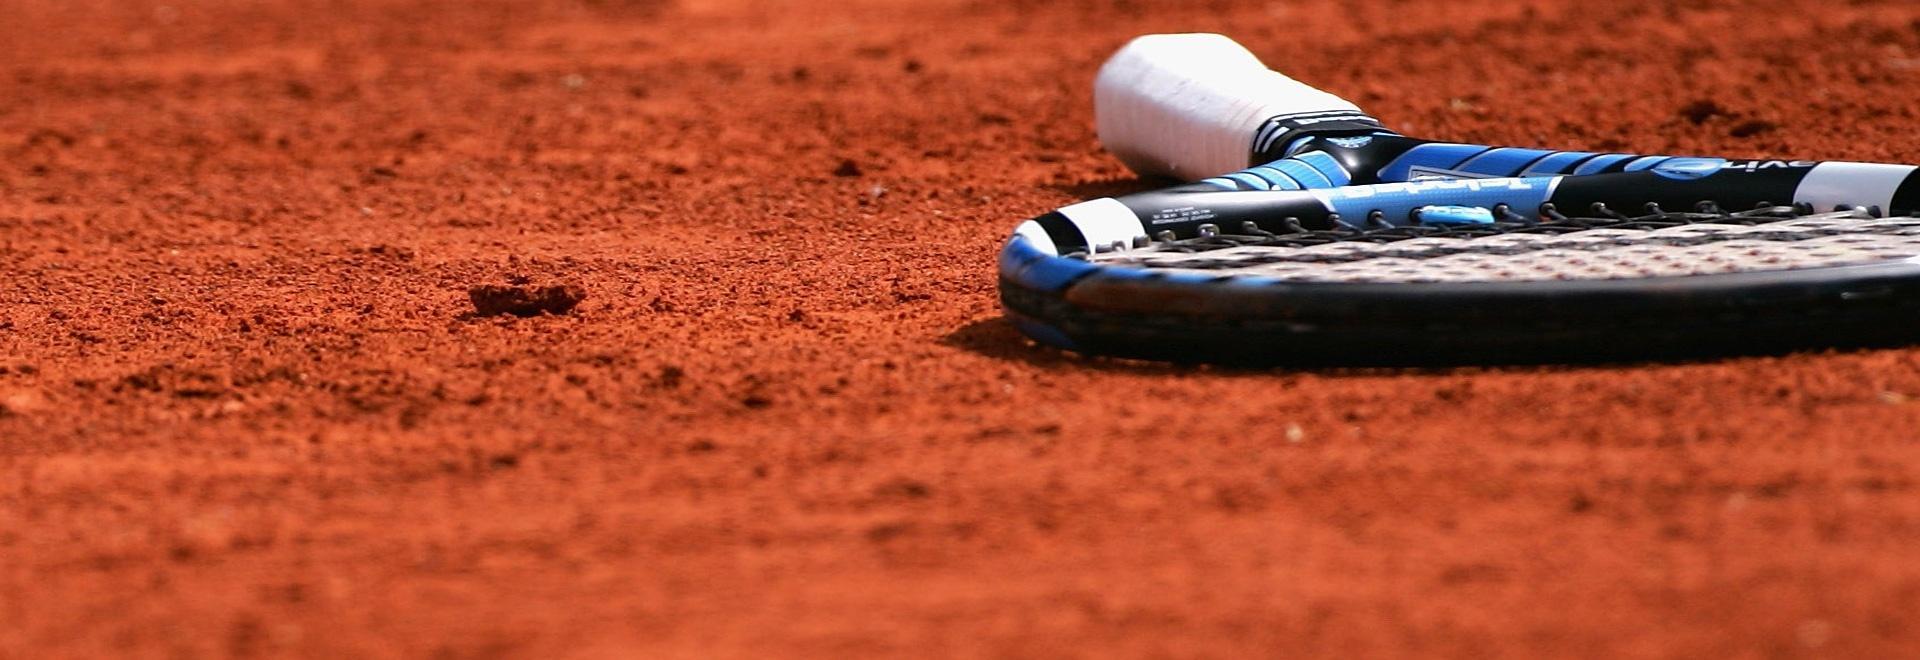 ATP World Tour Masters 1000 HL 2019